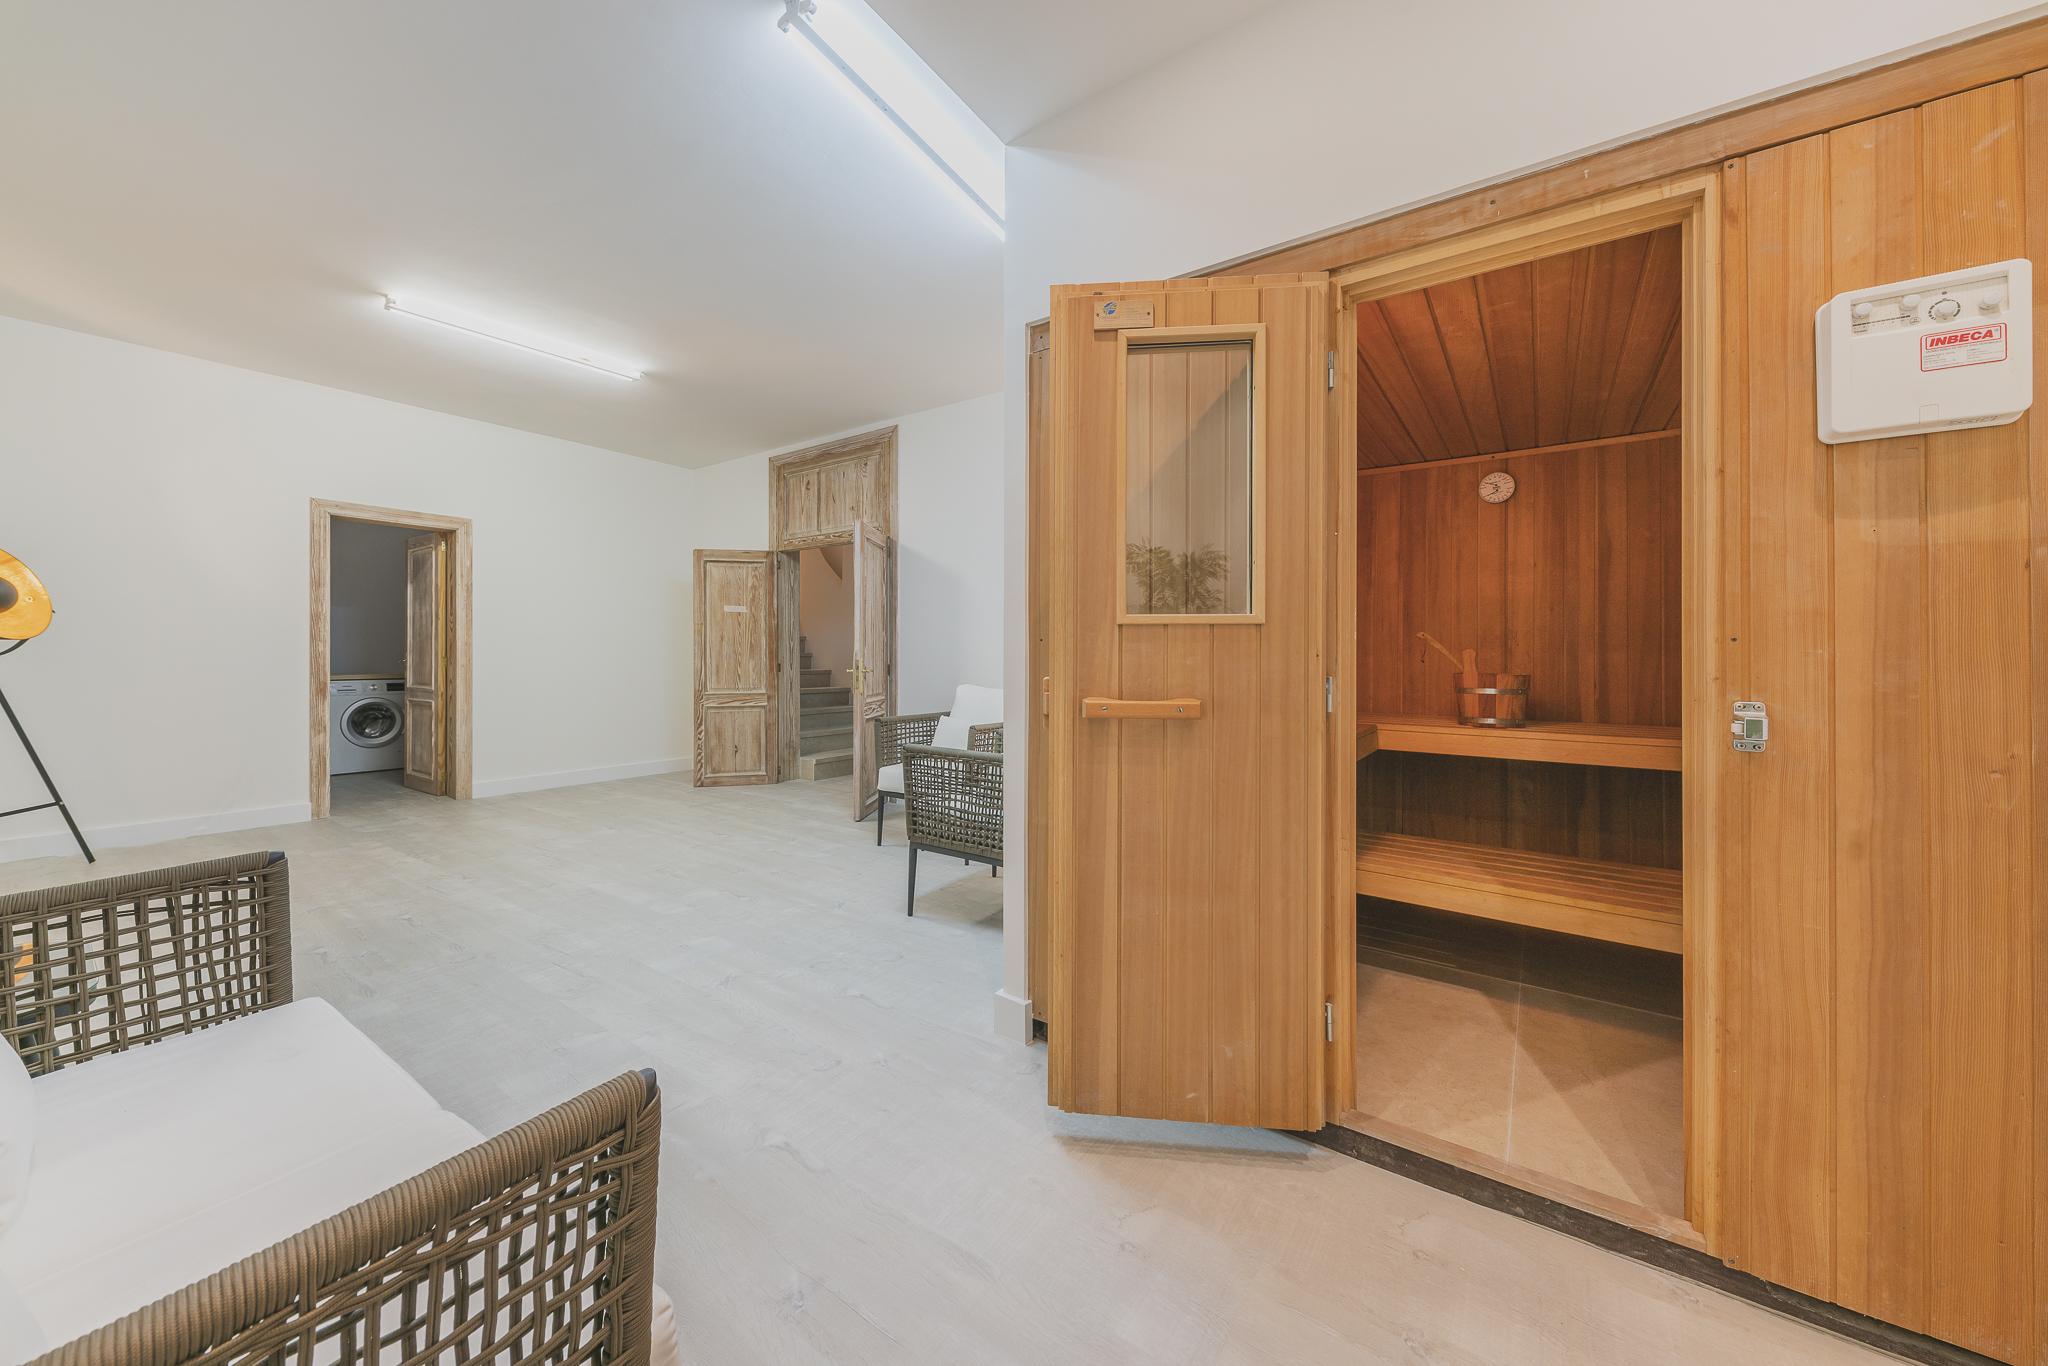 Apartment Luxury villa Luna  piscina climatizada  wi-fi  gym  sauna photo 20393756